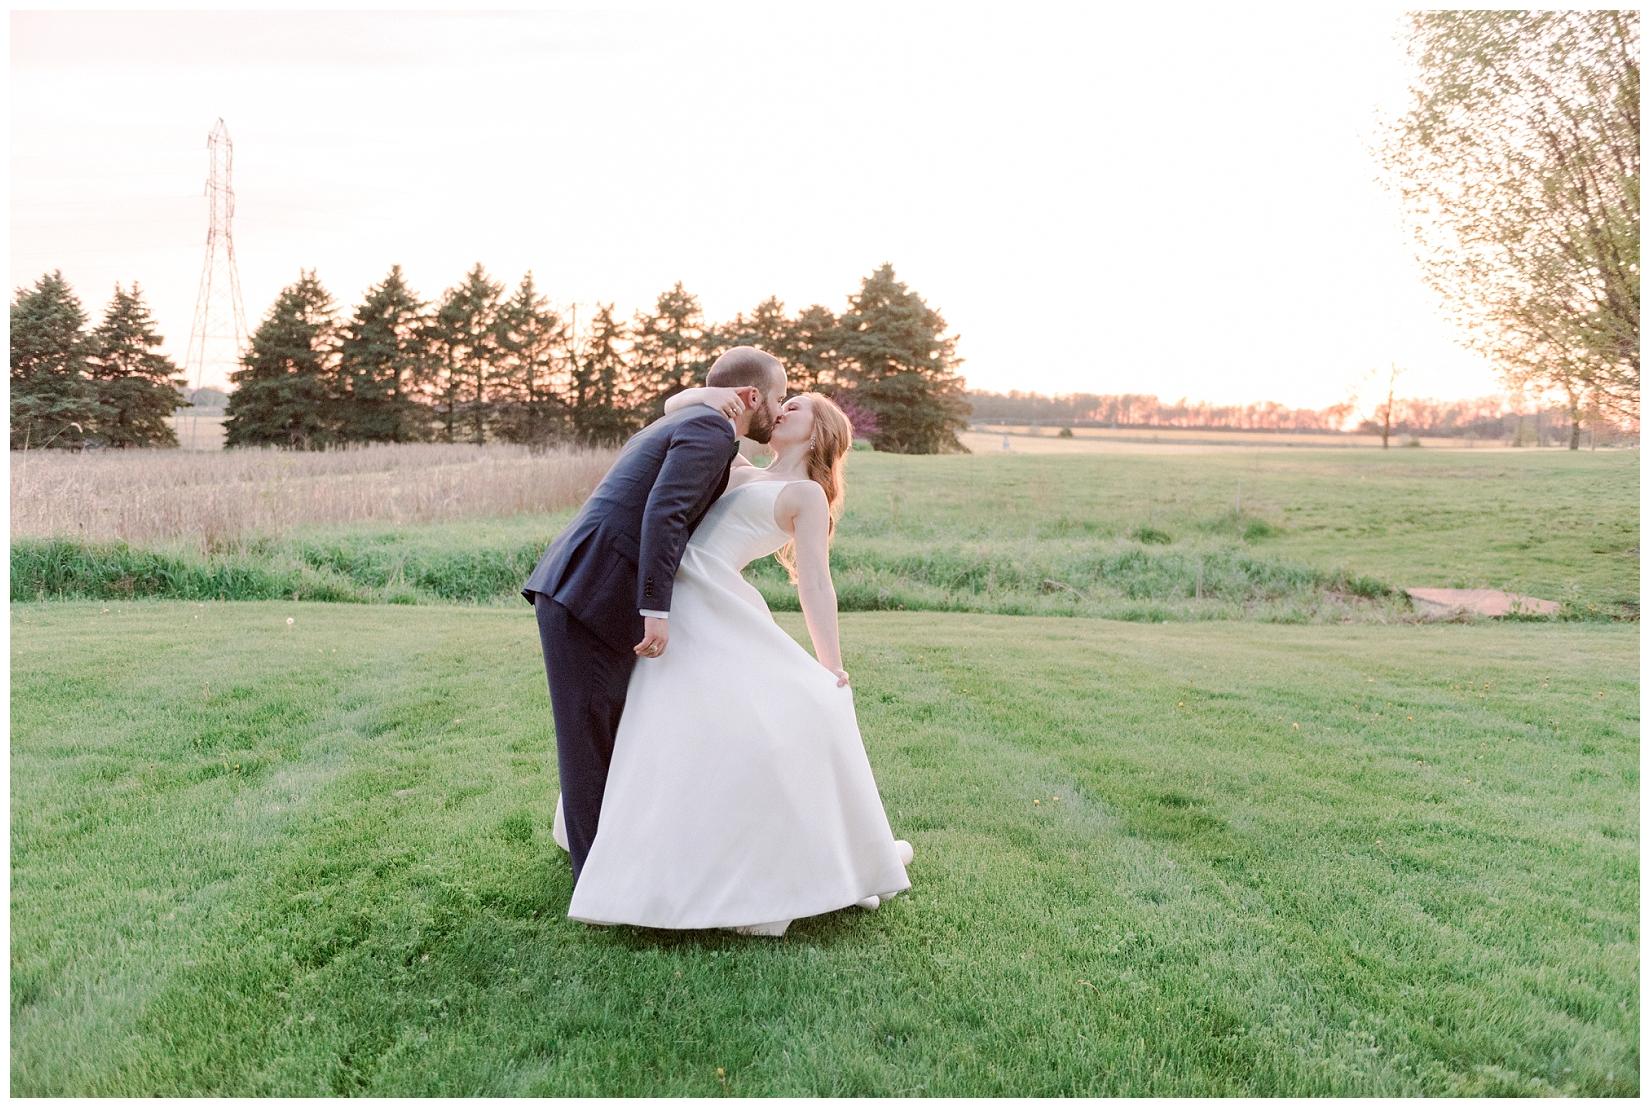 cat-alkire-wedding-photographer-indiana-chicago-indianapolis-fort-wayne_1235.jpg